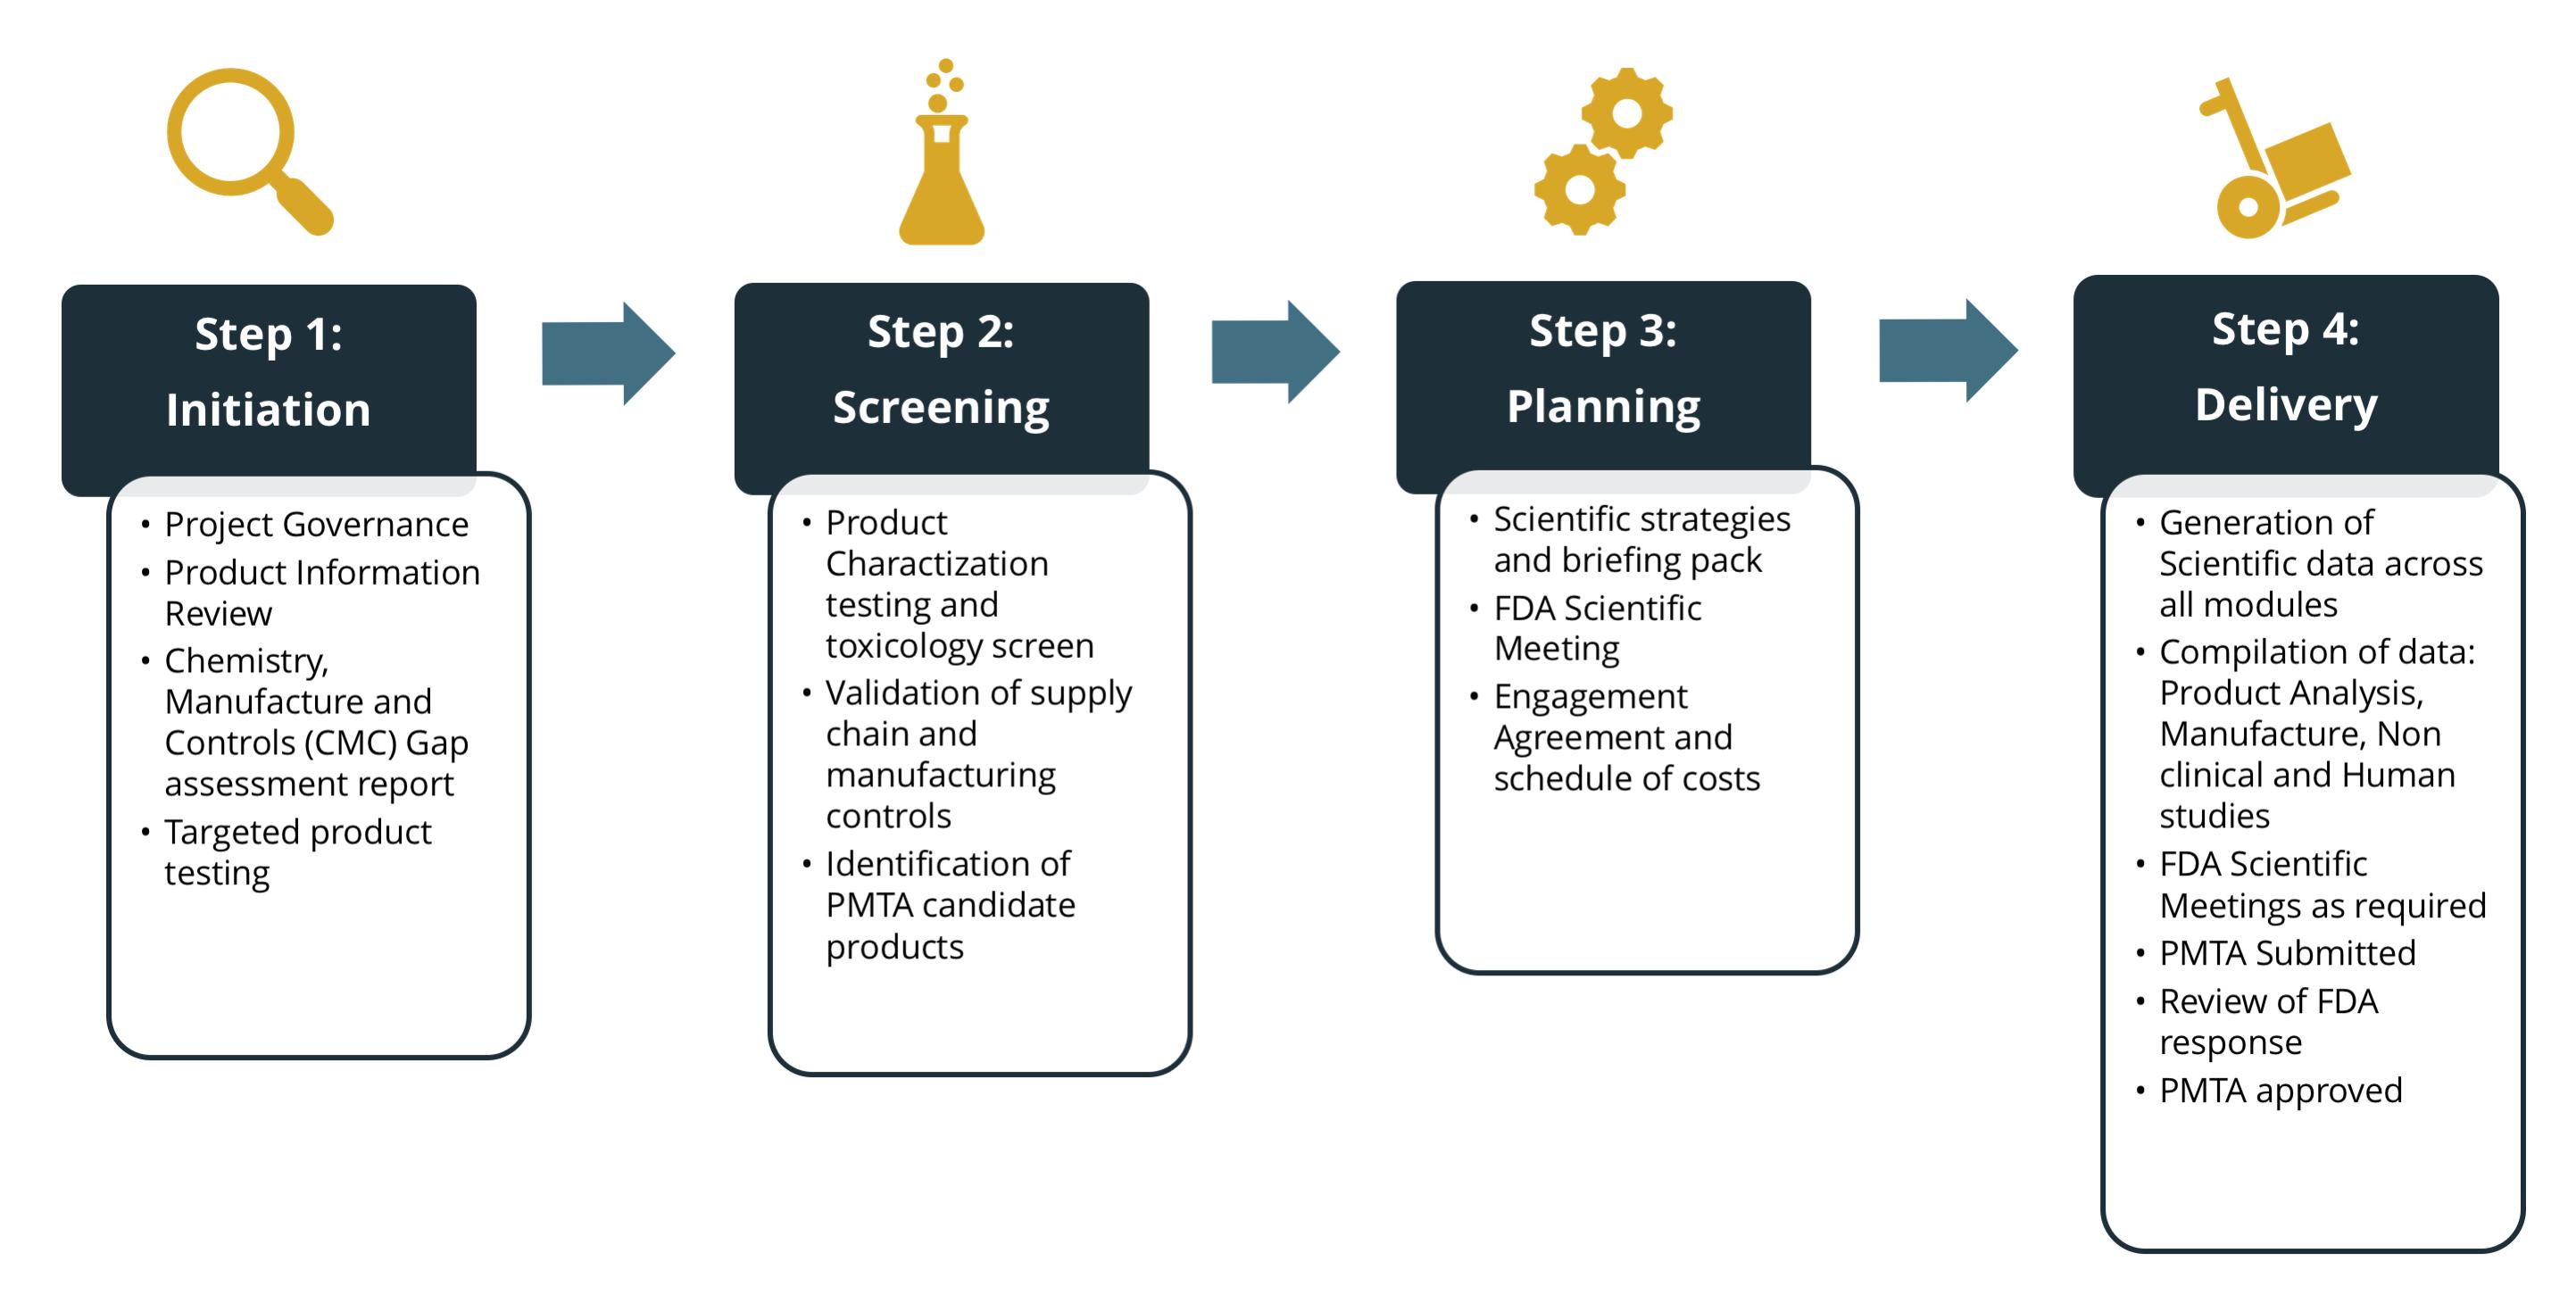 US PMTA - 4 step process